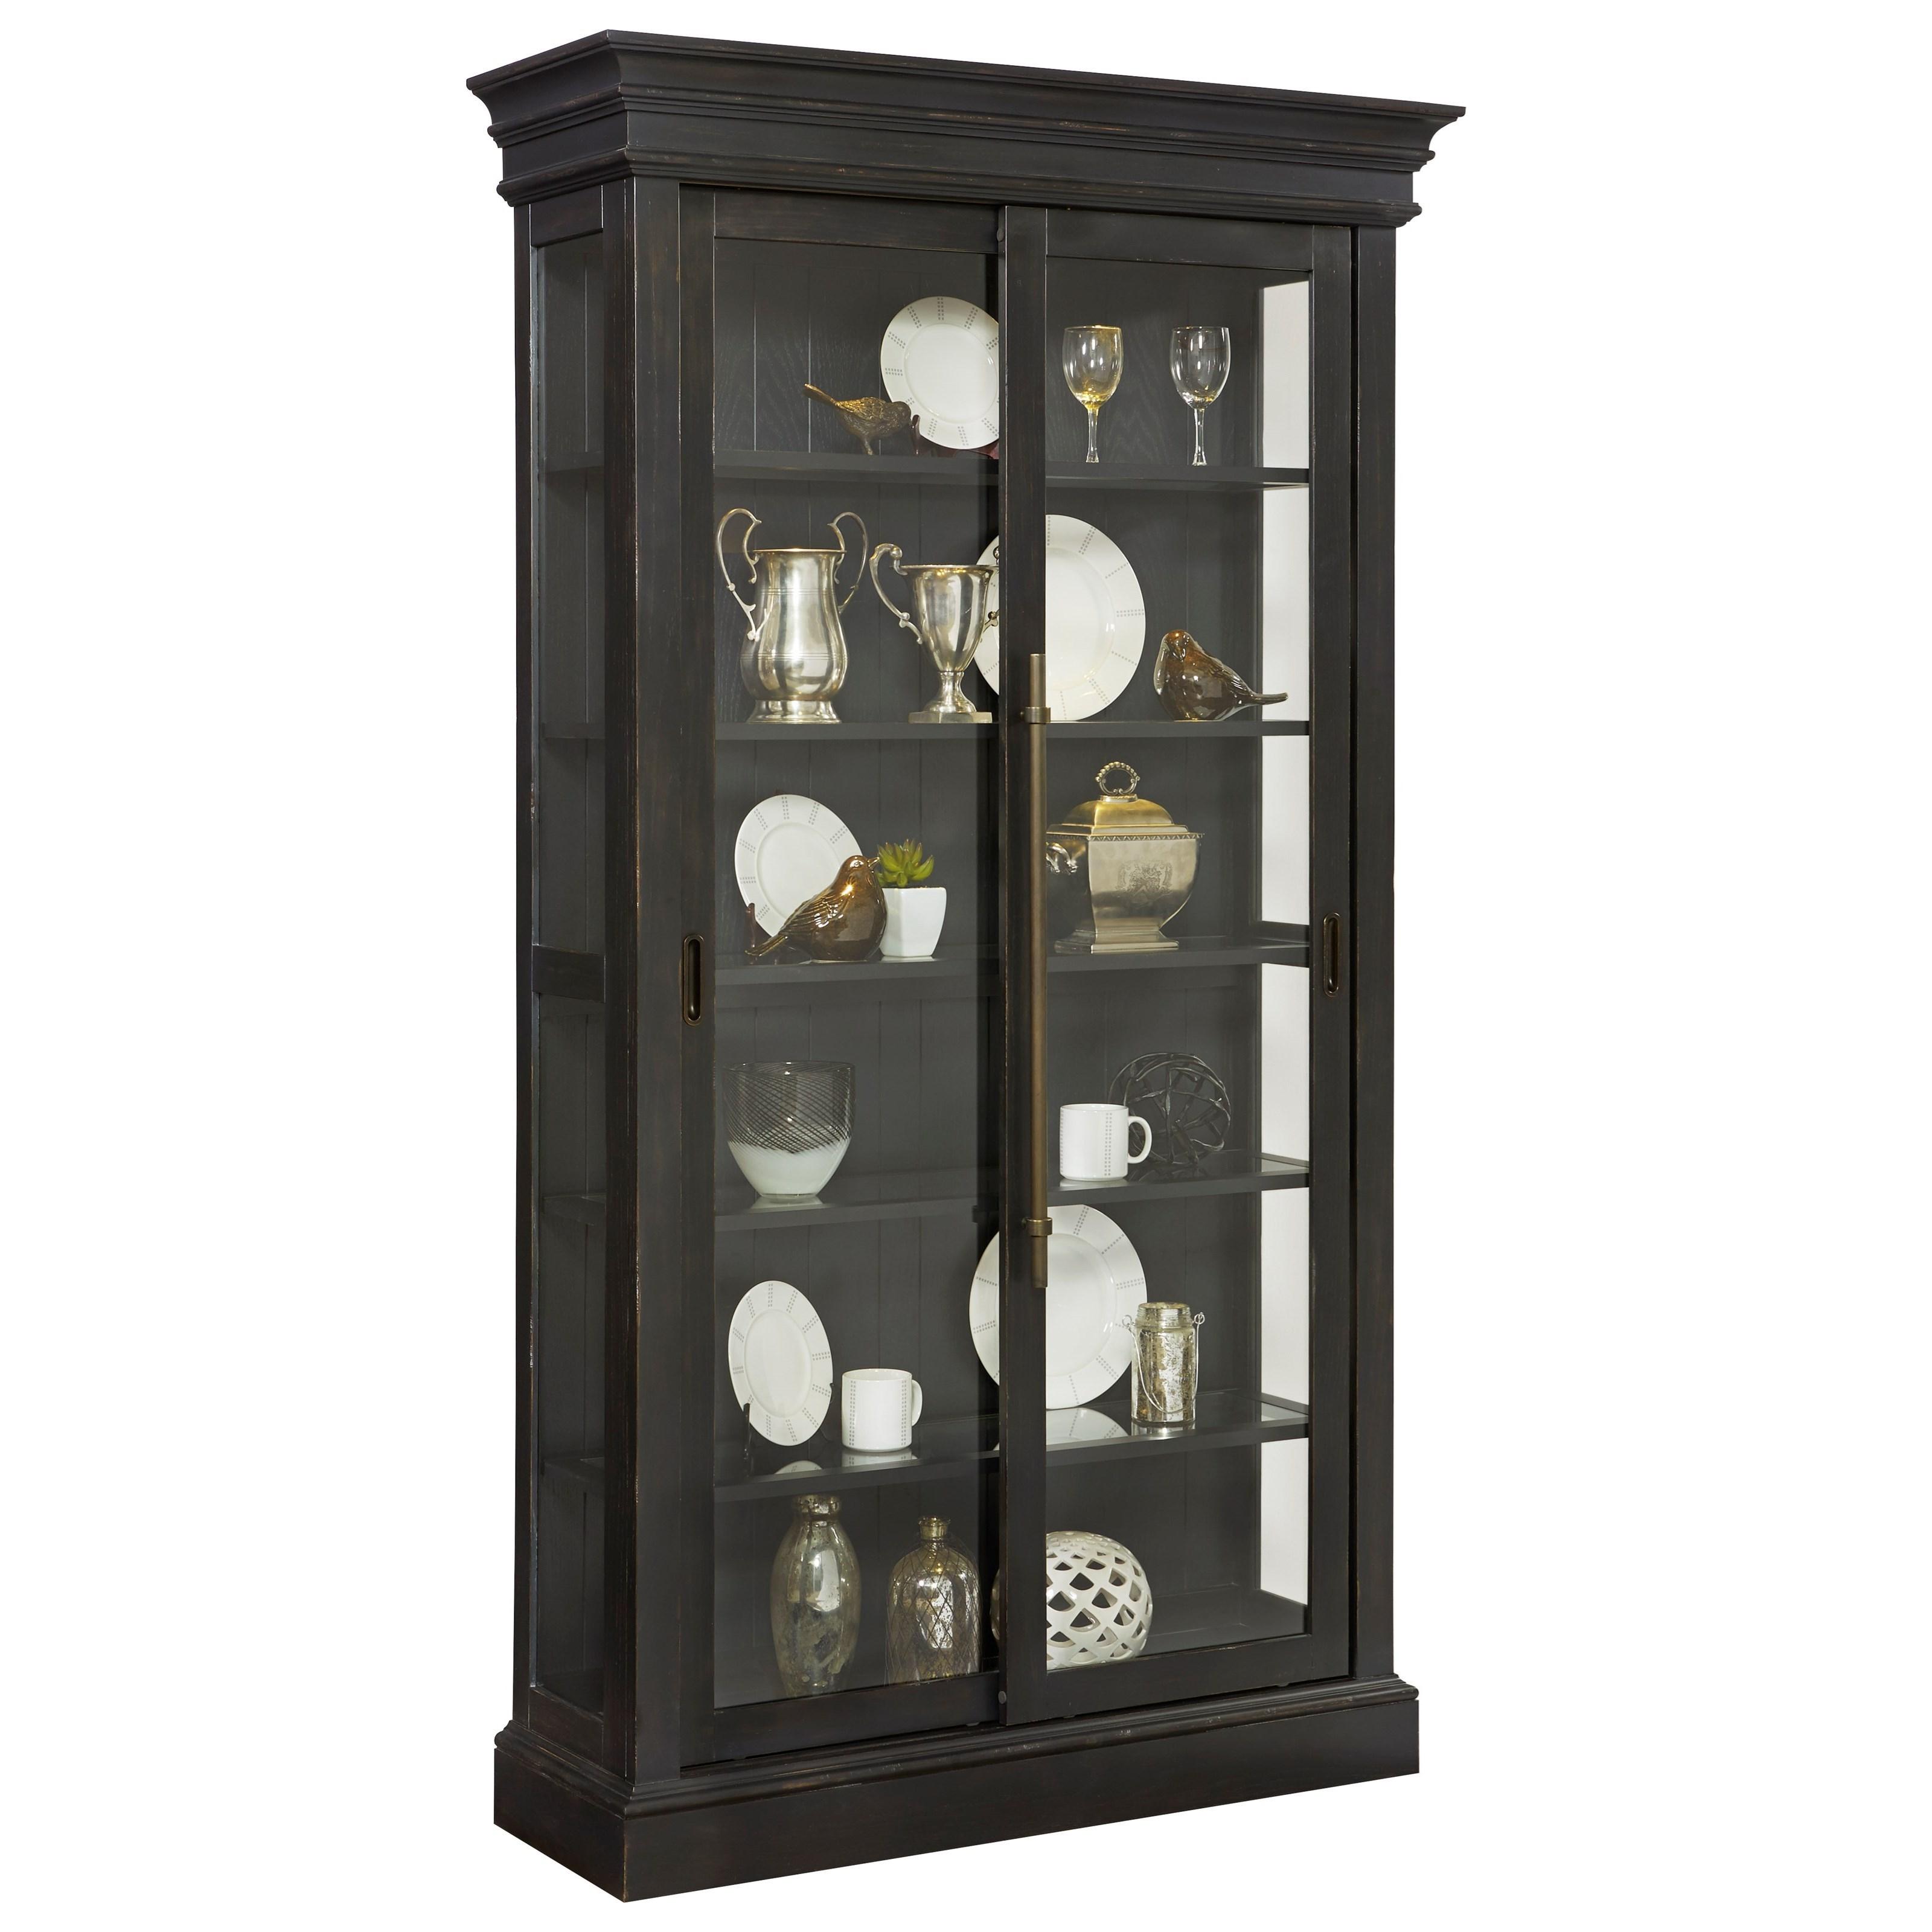 Pulaski furniture curios sliding door curio in charcoal for Curio cabinet